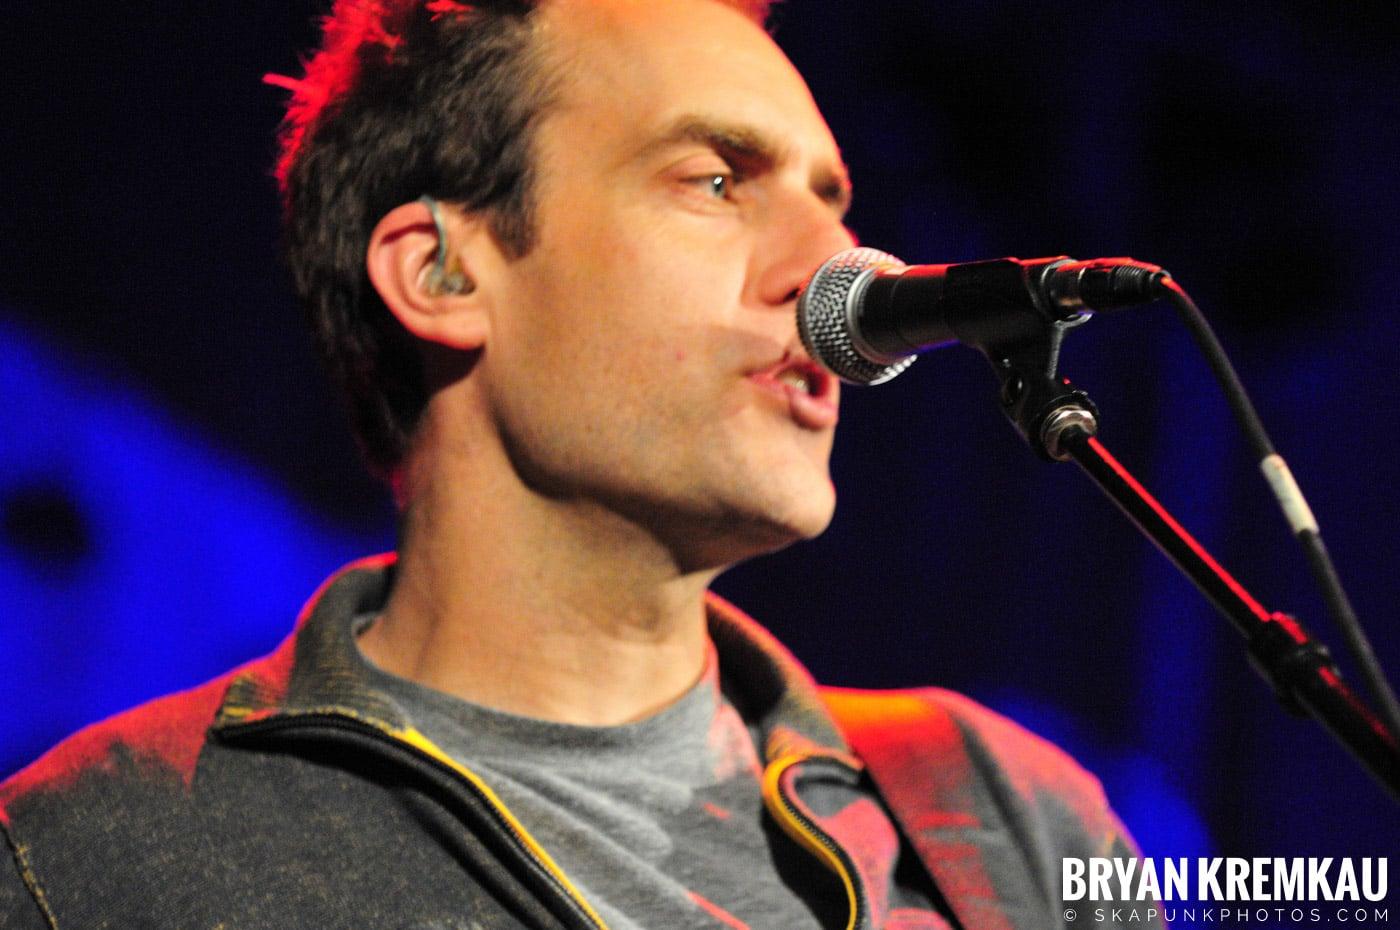 Great Big Sea @ Tarrytown Music Hall, Tarrytown, NY - 10.10.09 (23)